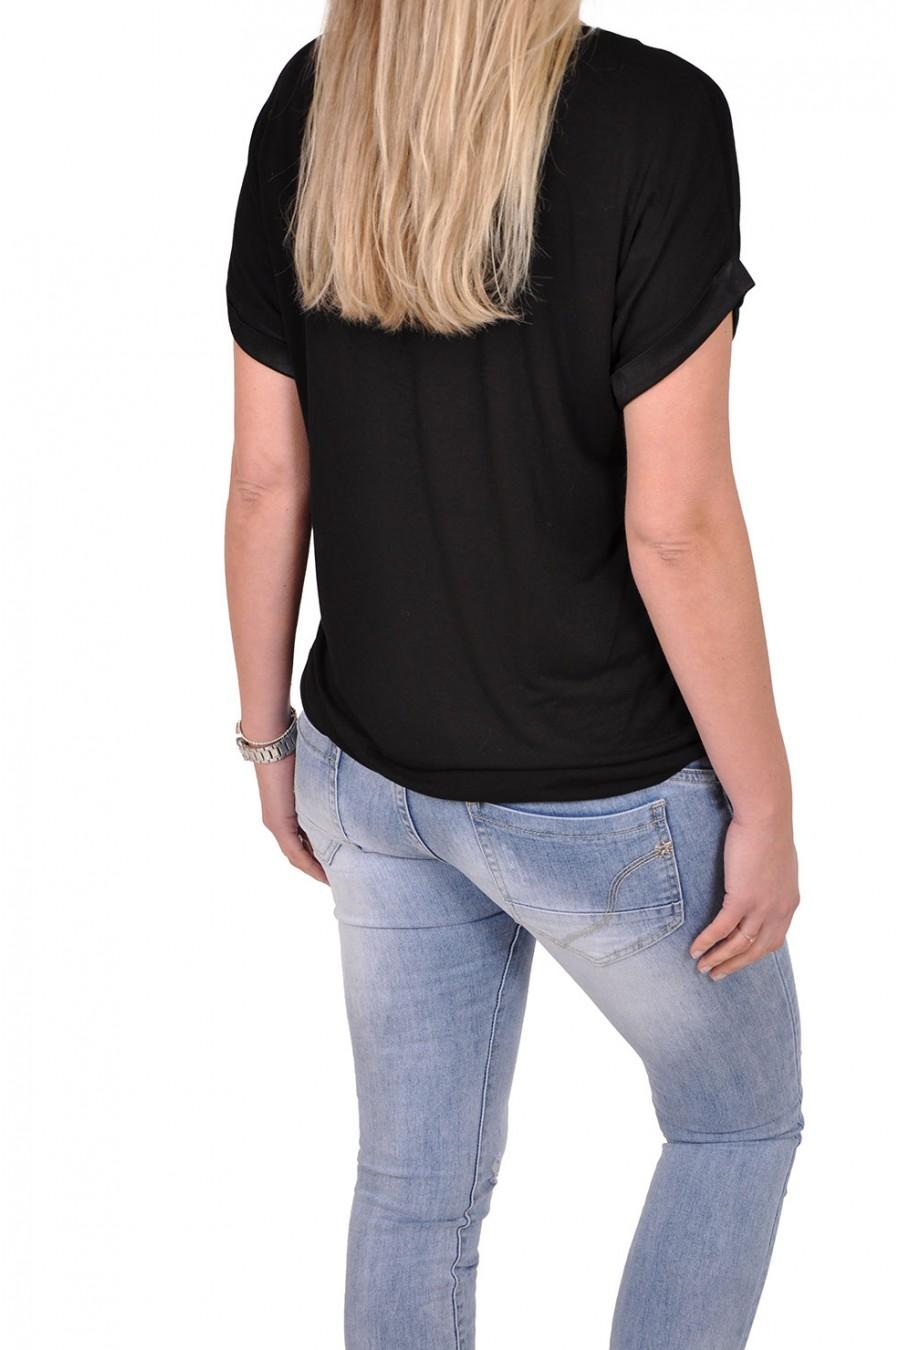 Silk touch v-hals top Gemma Ricceri zwart Gemma Ricceri